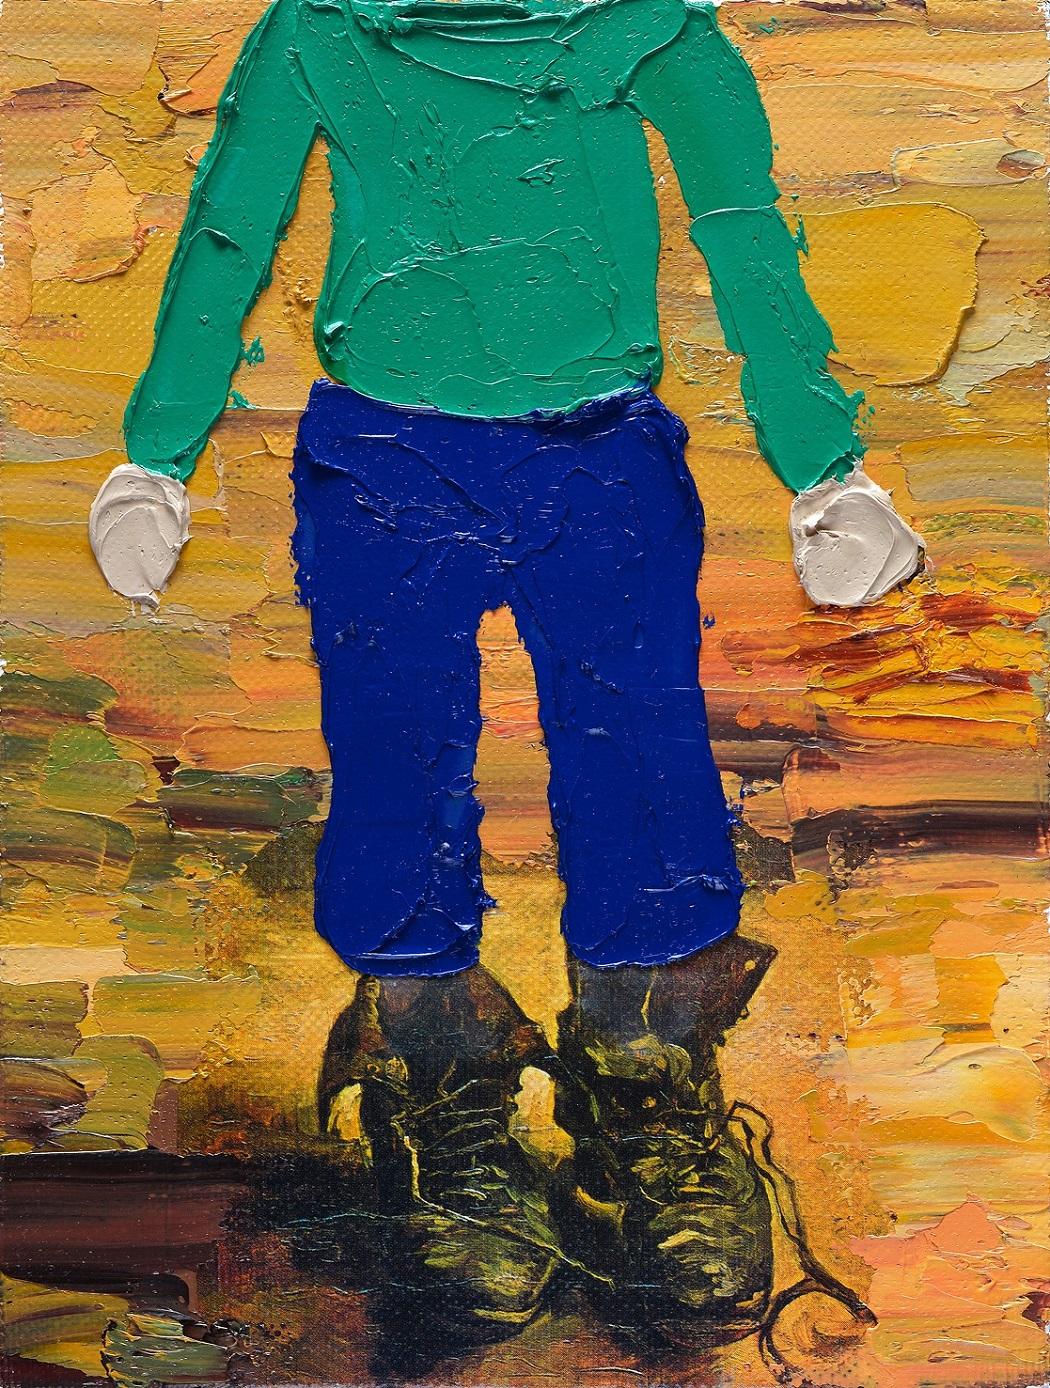 Przemek Matecki: Vincent van Gogh, unsigniert, o. J., 20 x 15 cm, courtesy Raster Gallery, © Künstler